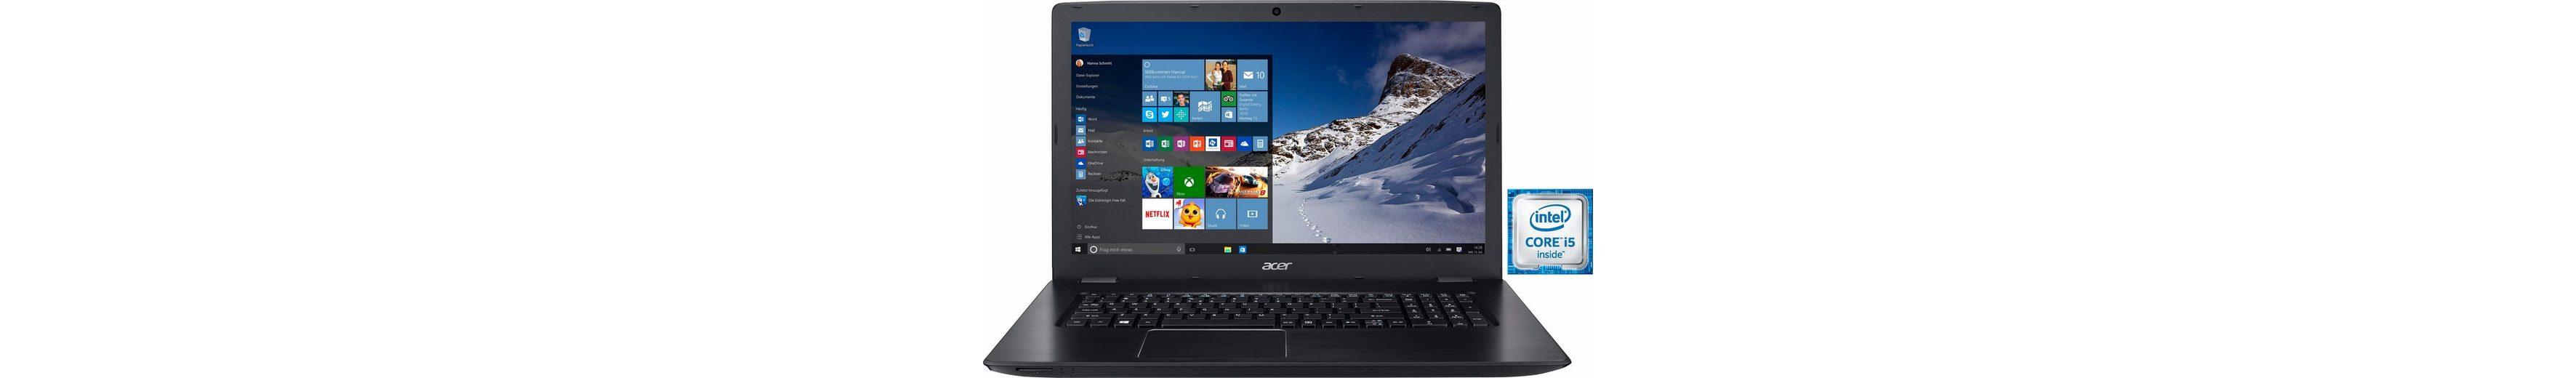 Acer E5-774G-508D Notebook, Intel® Core™ i5, 43,9 cm (17,3 Zoll), 1000 GB Speicher, 8192 MB DDR4-RAM